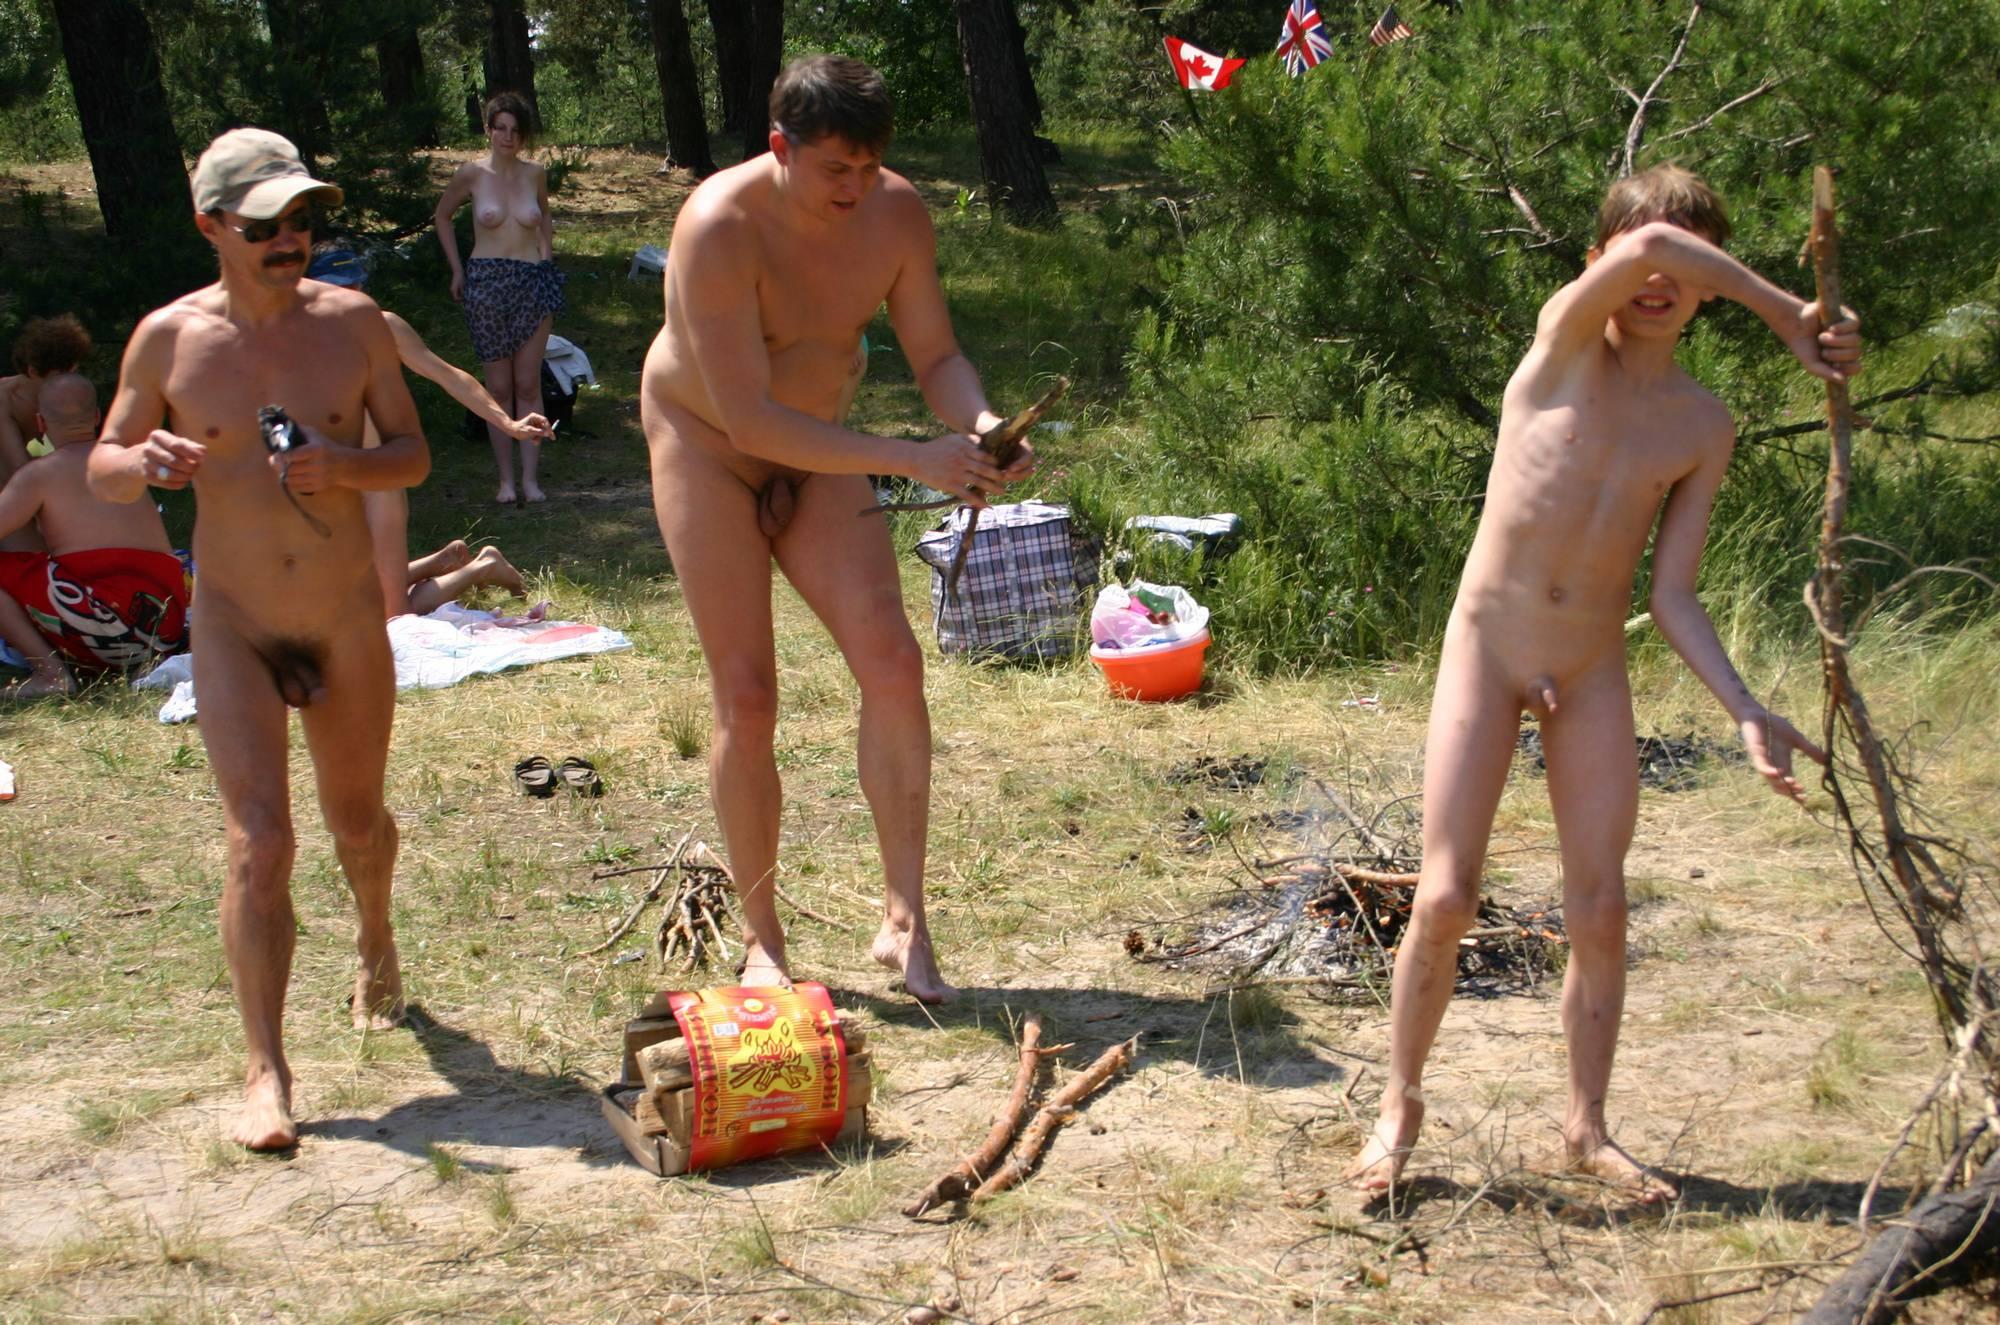 Pure Nudism Photos-Kiev Outdoor Recreation - 1